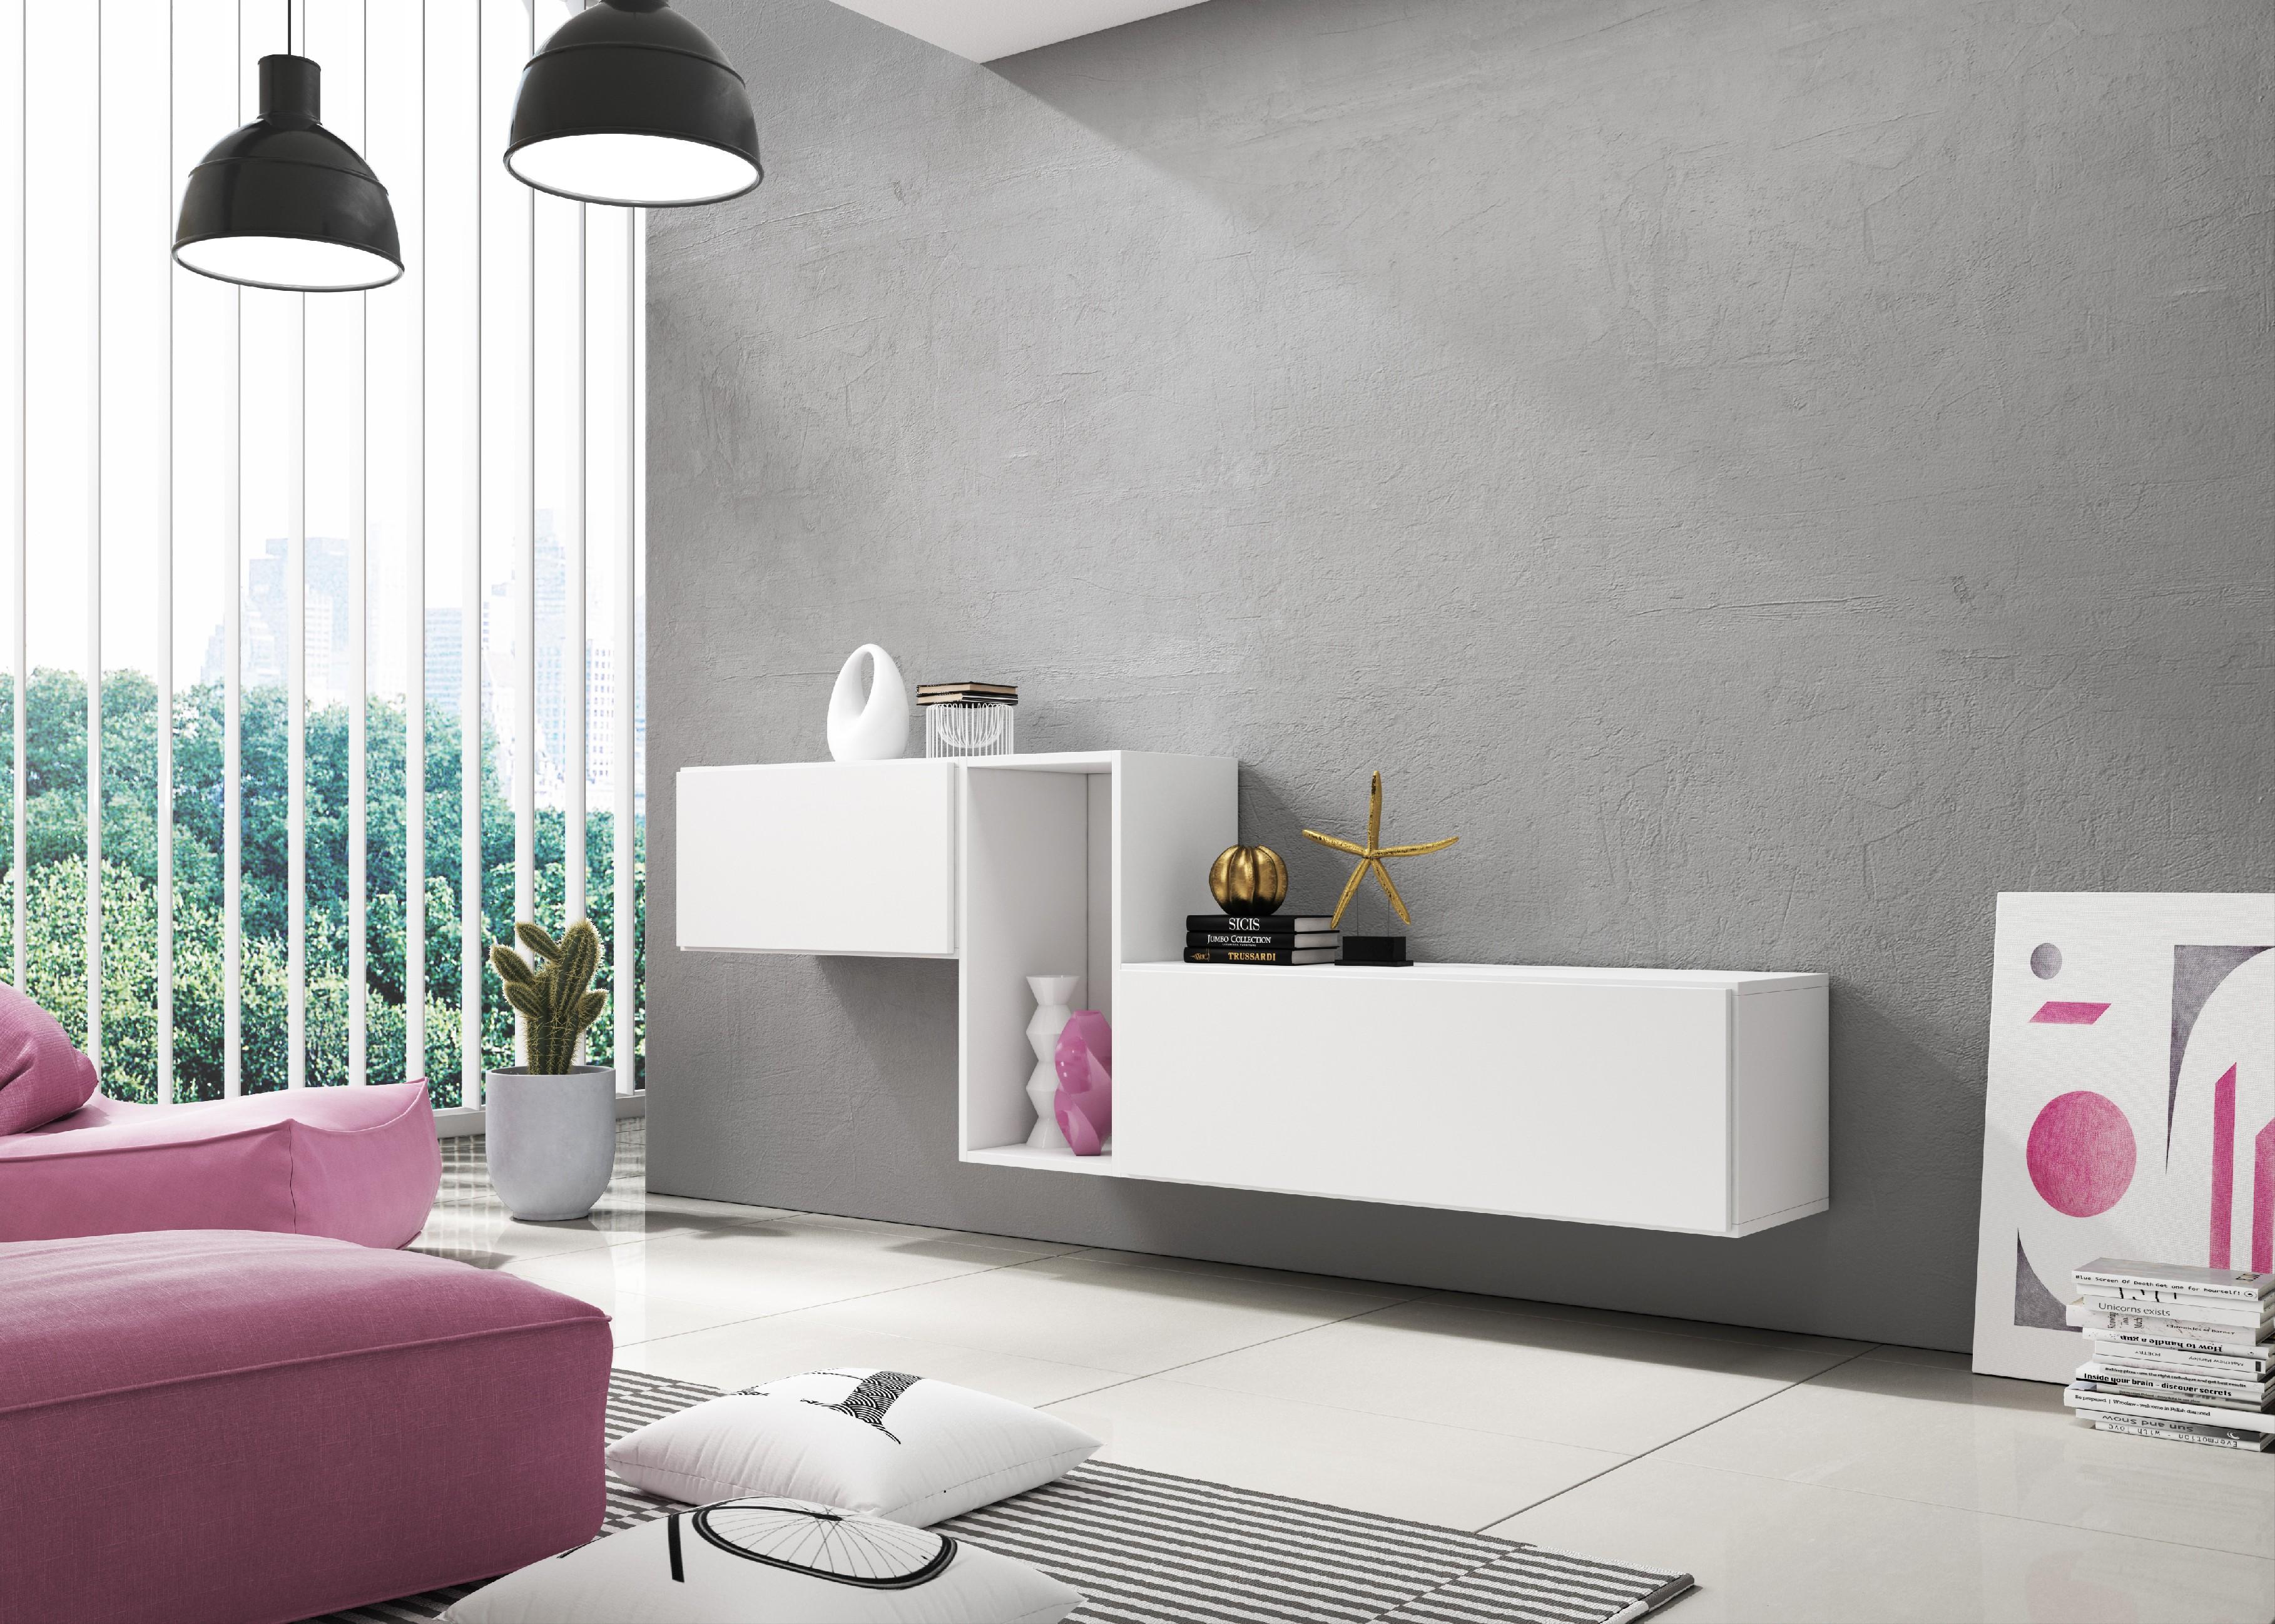 Artcam Zostava do obývačky ROCO 11 roco: korpus biely mat / okraj biely mat / dvierka biely mat